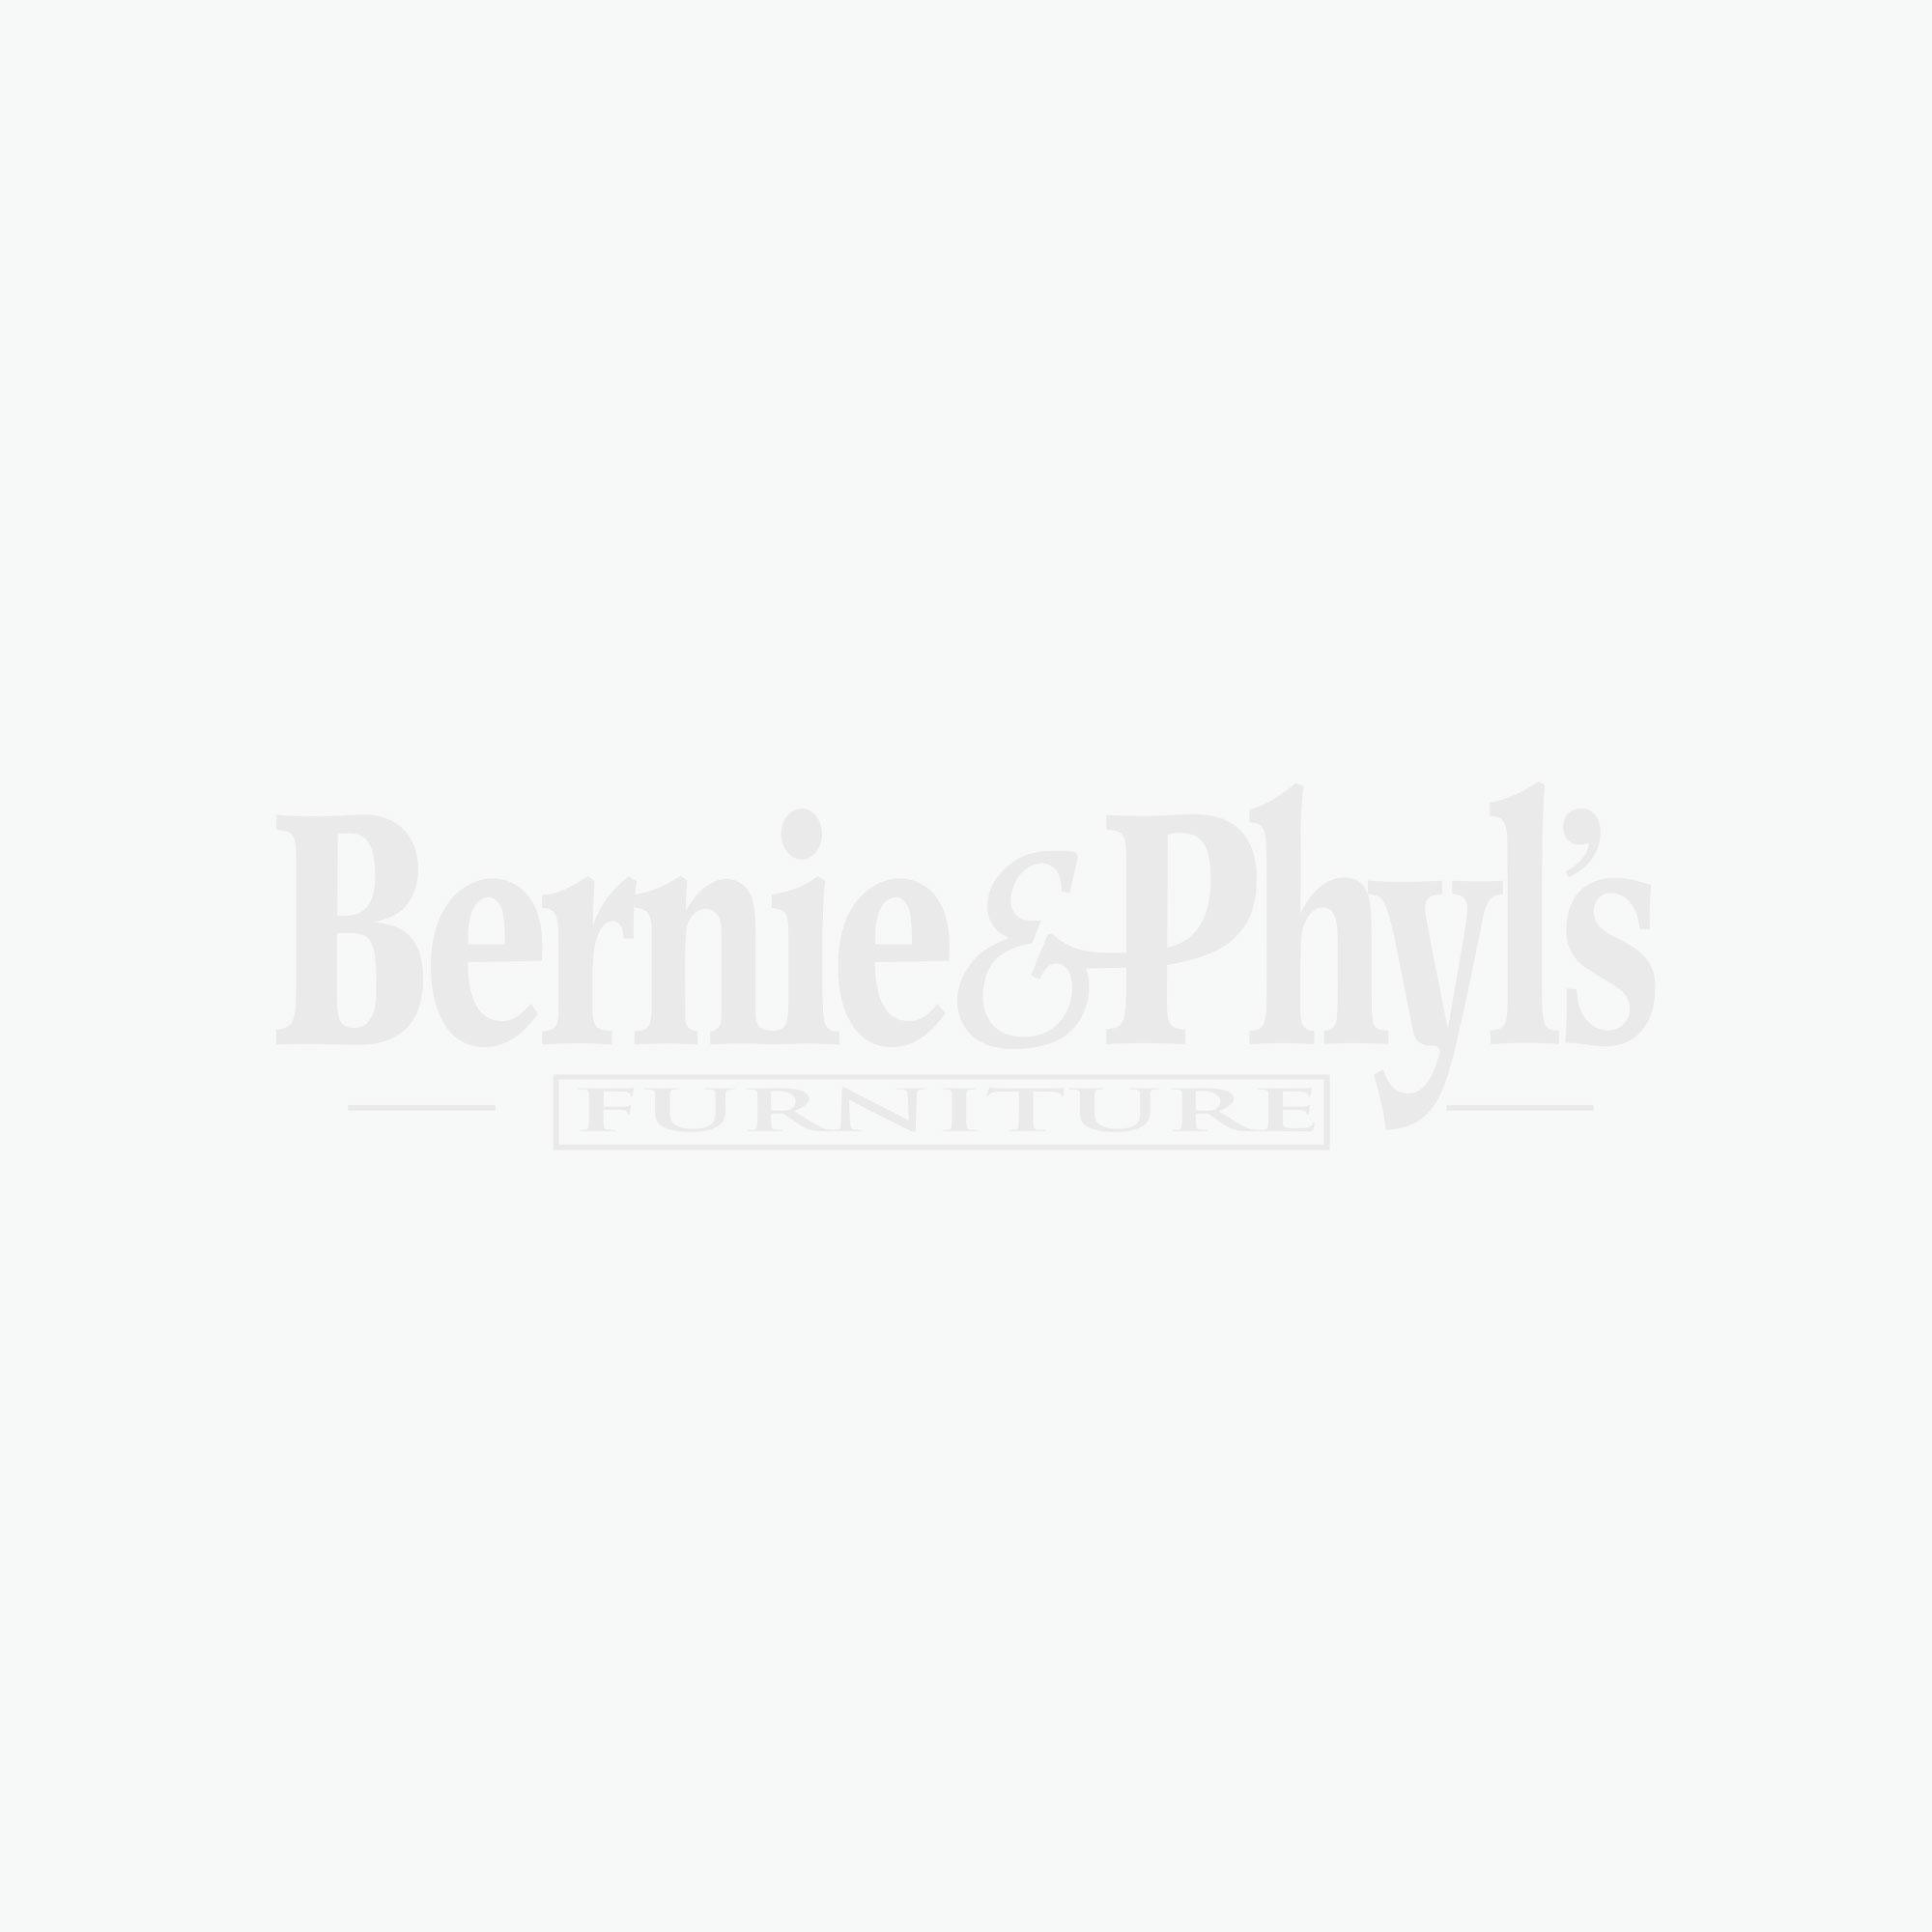 Bedford Merlot Panel Headboard